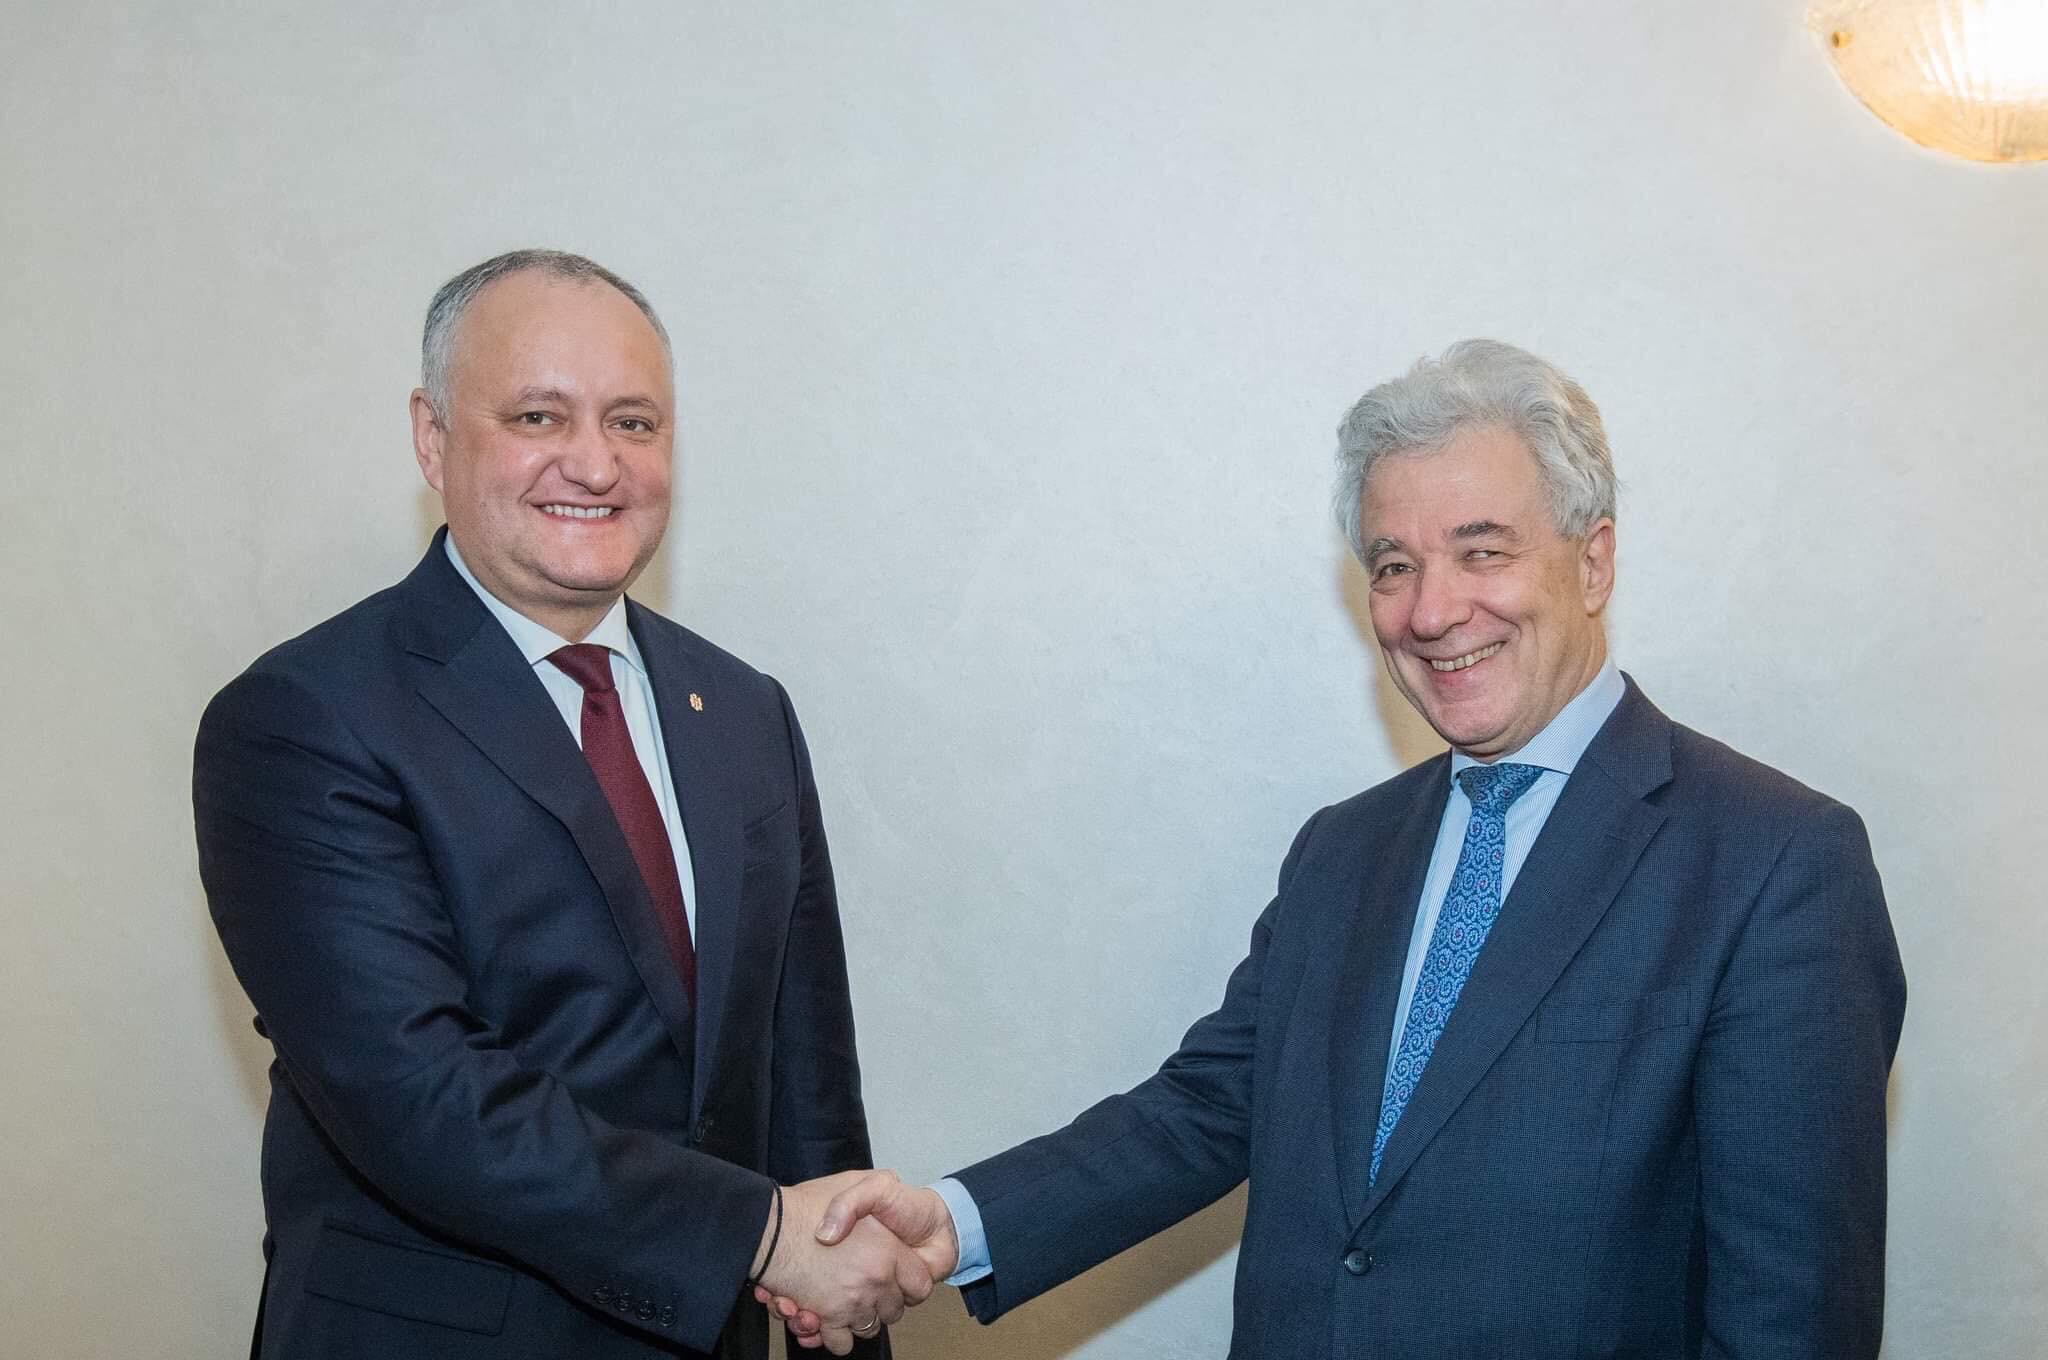 Президент встретился со Спецпредставителем албанского Председательства ОБСЕ (ФОТО, ВИДЕО)